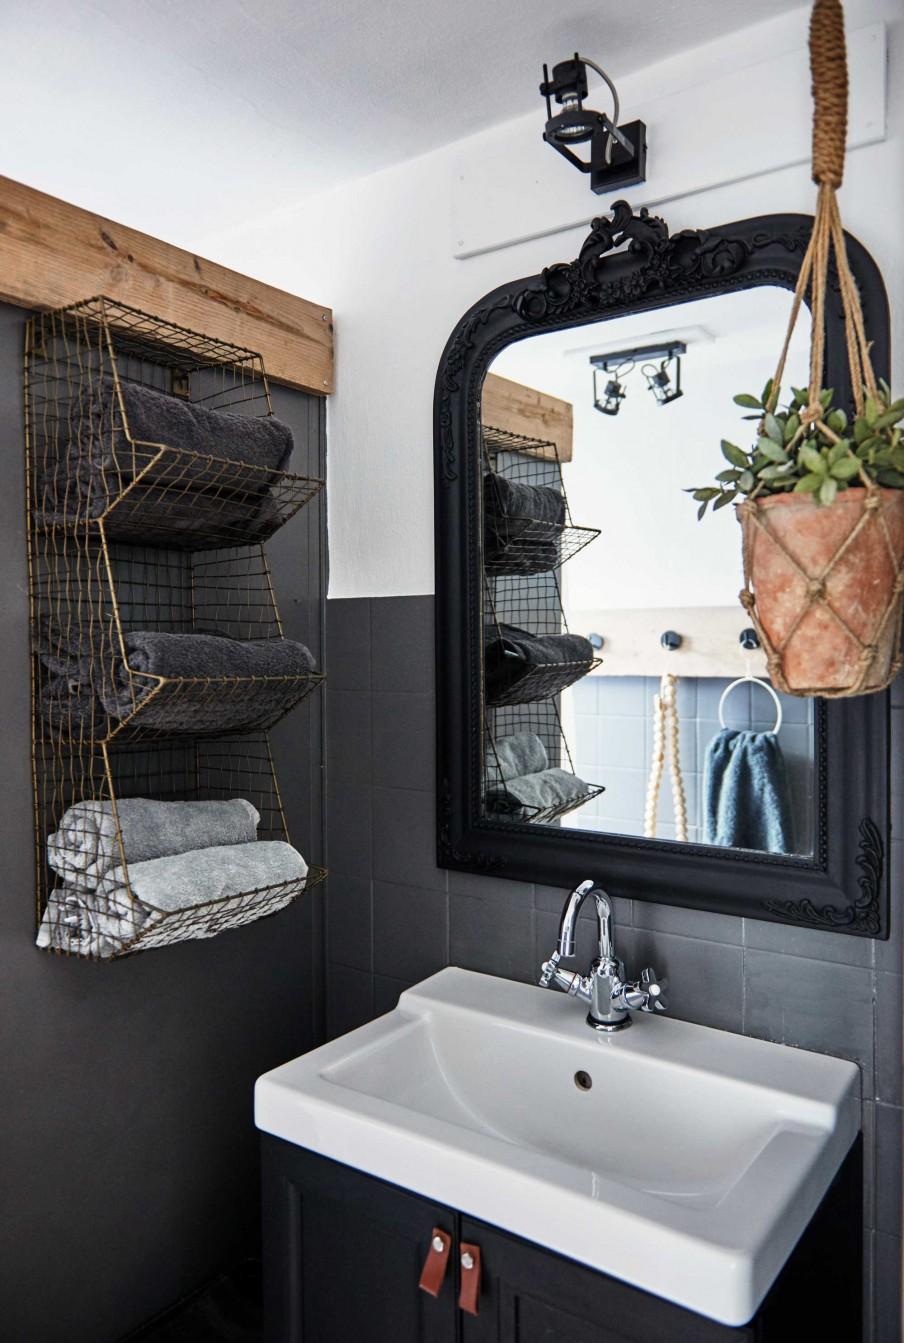 12-badkamer-spiegel